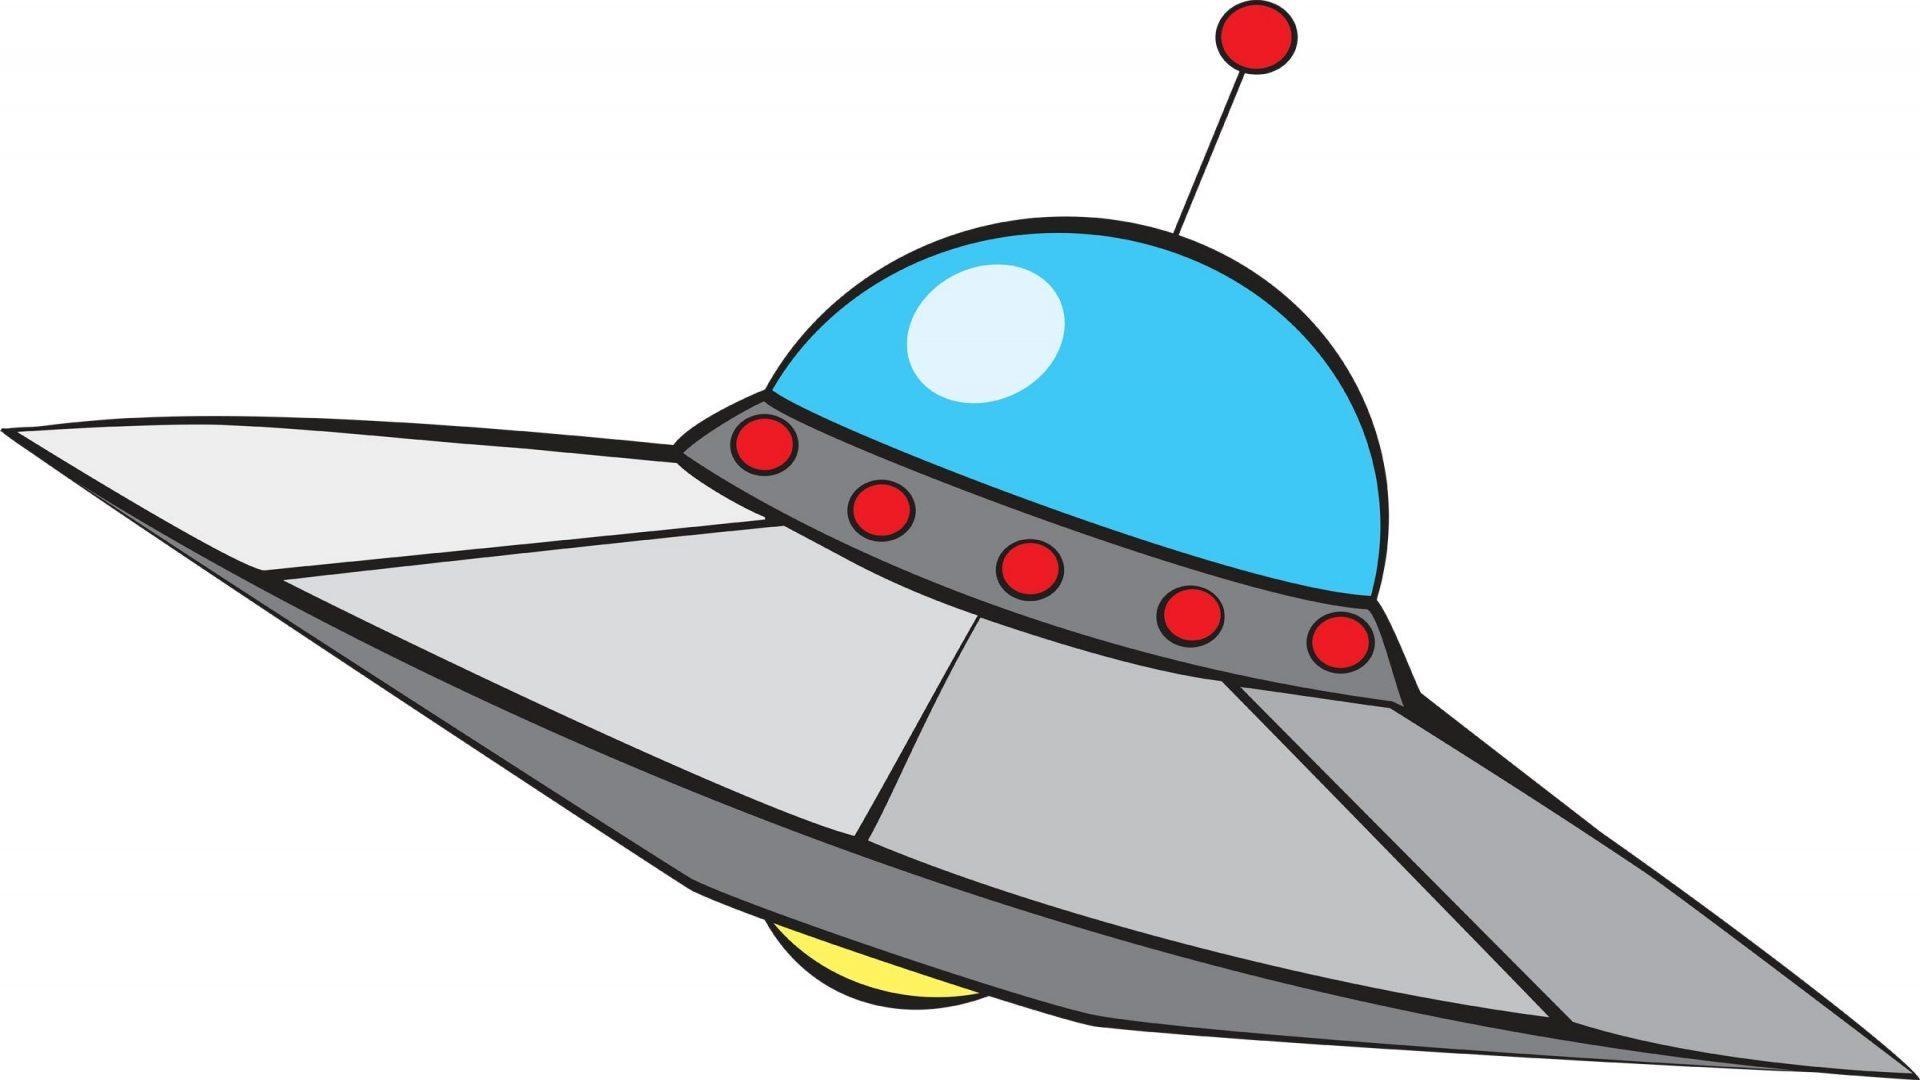 Spaceship clipart. Alien at getdrawings com